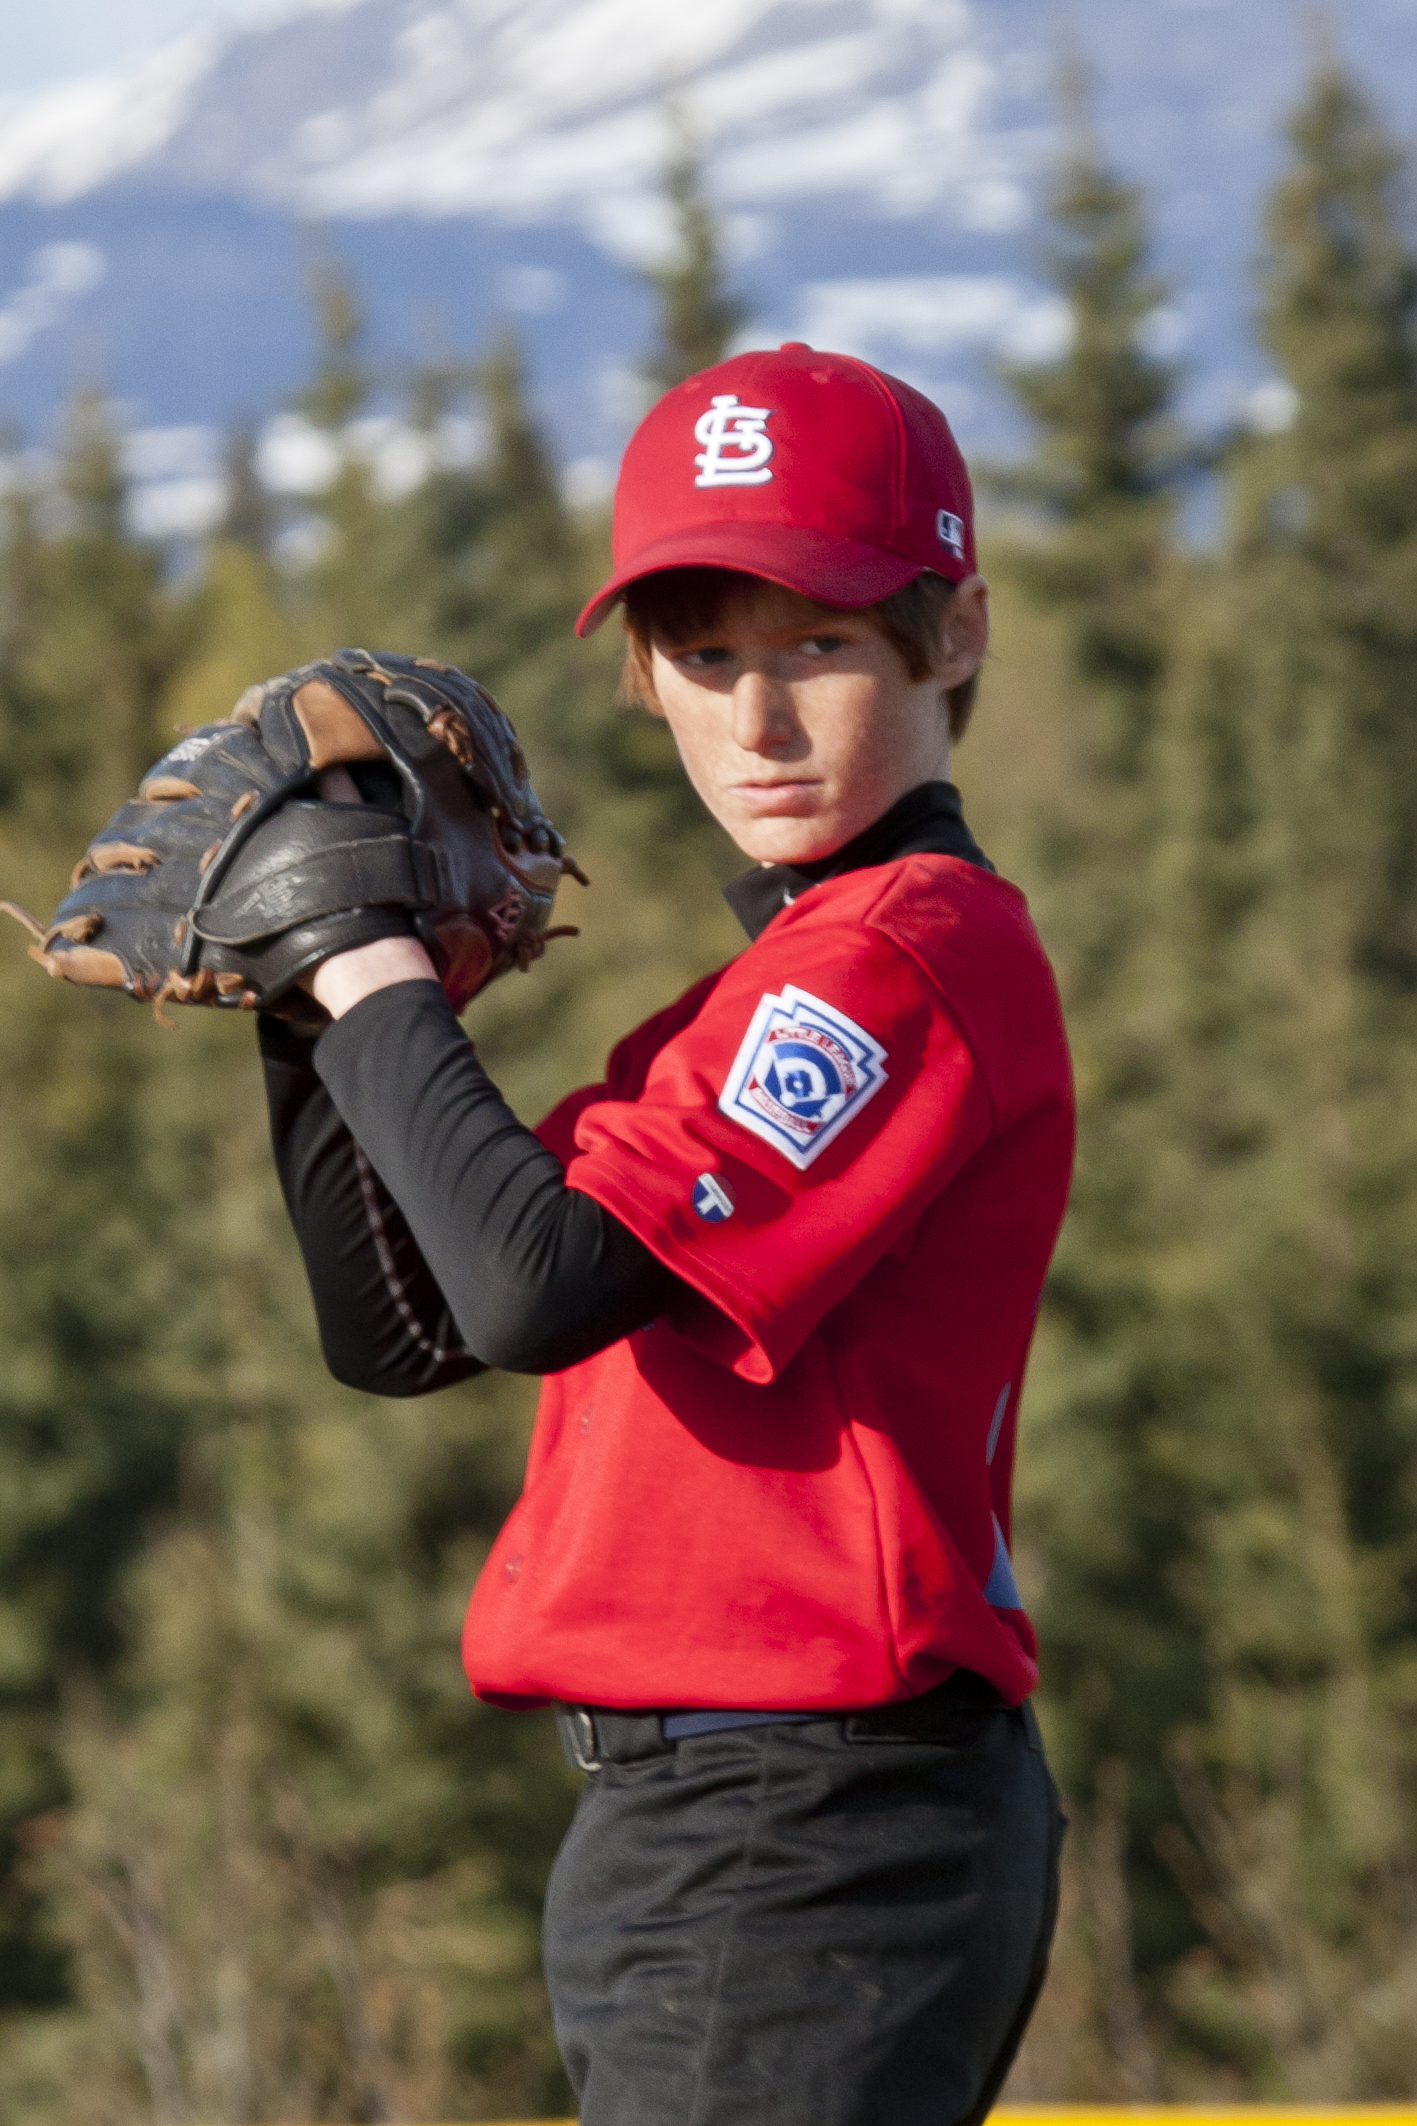 Alex pitching 051812